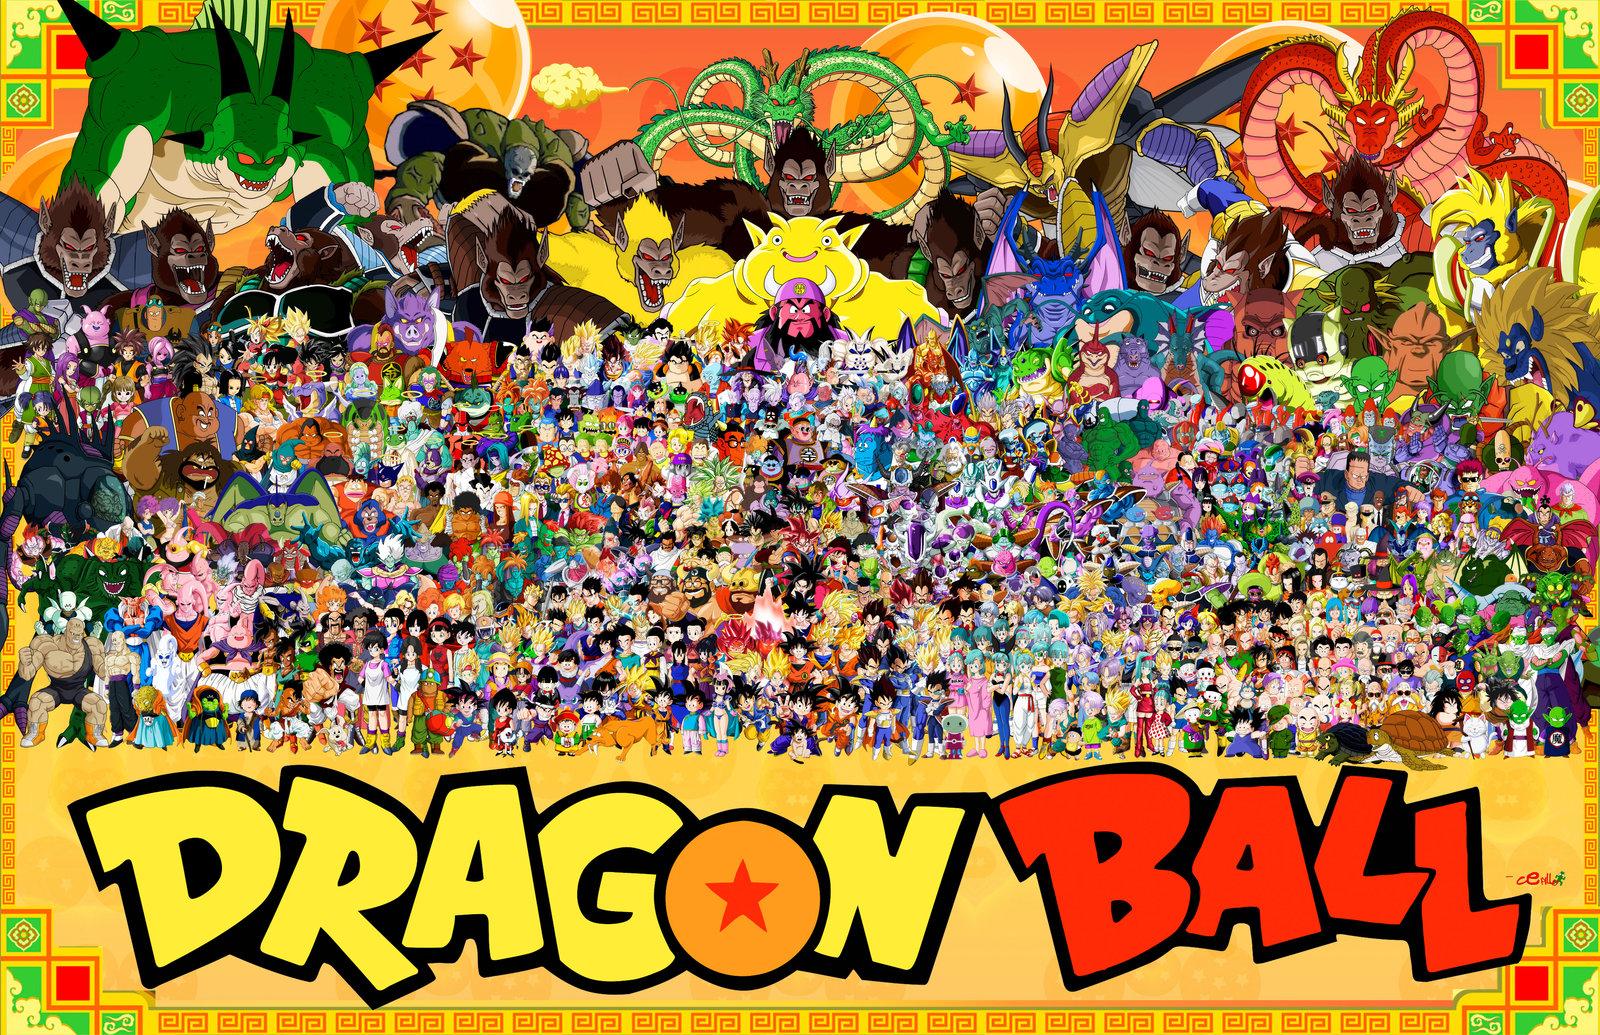 Dragon Ball Z Wall Paper: Best Dragon Ball Z Wallpaper